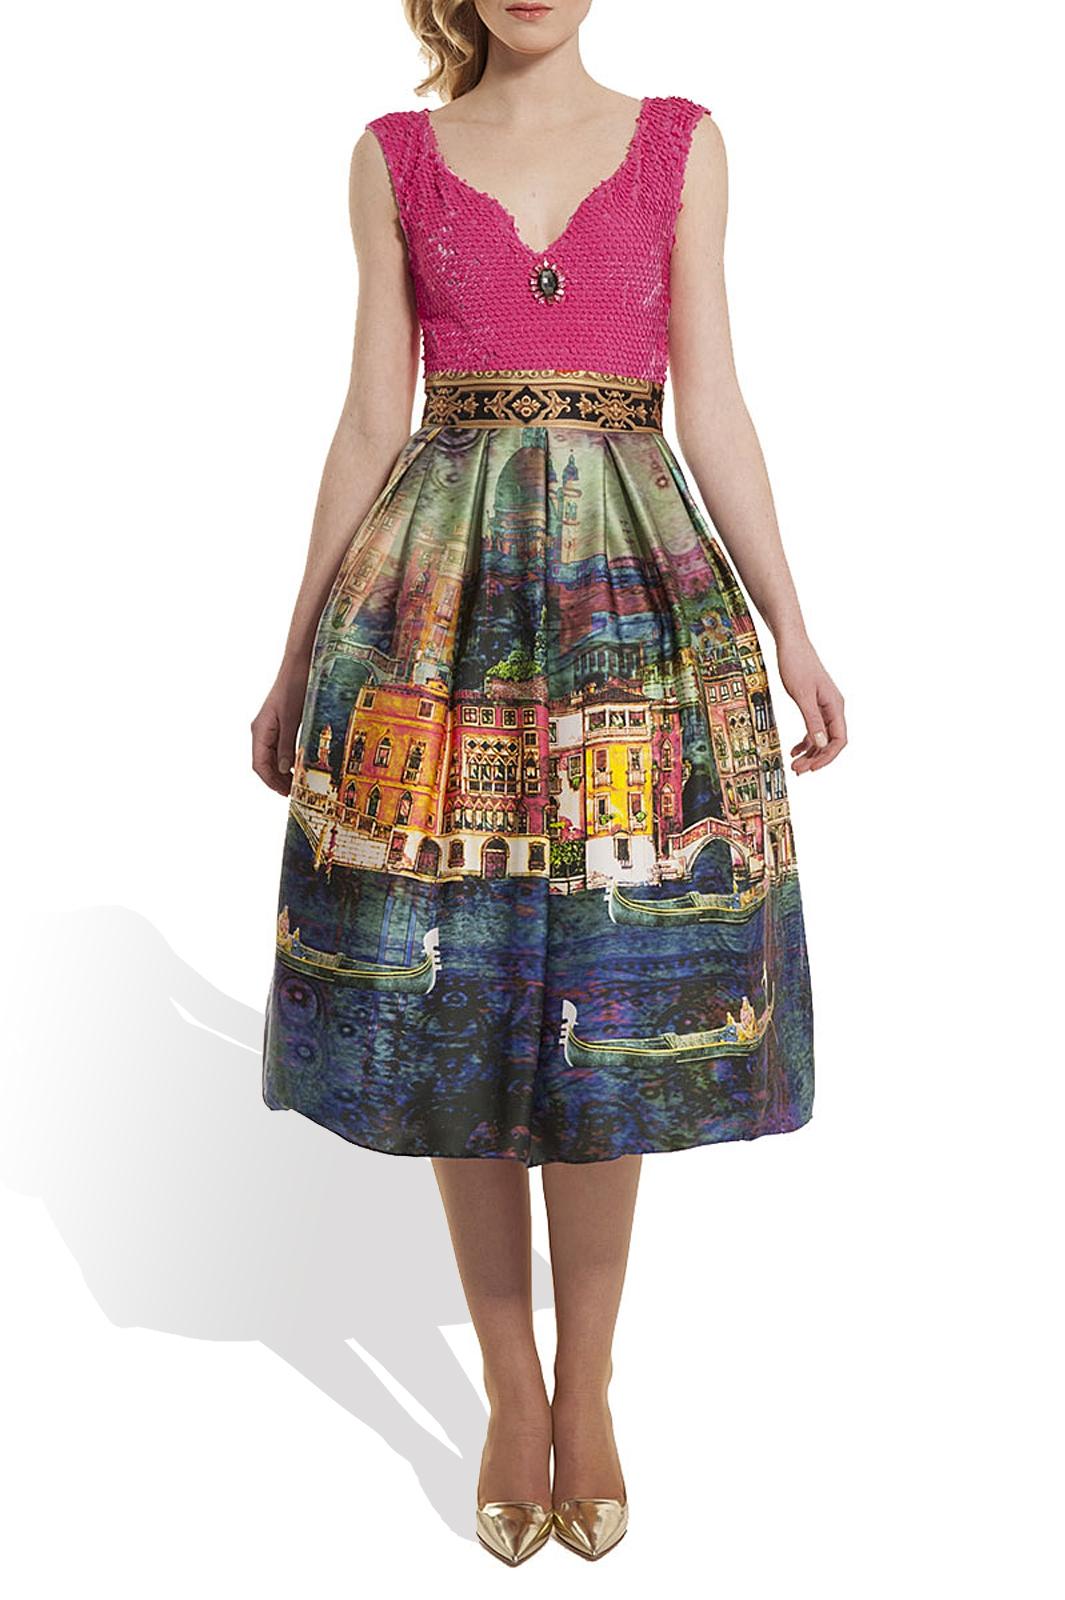 Silk Dress by ELENA PERSEIL